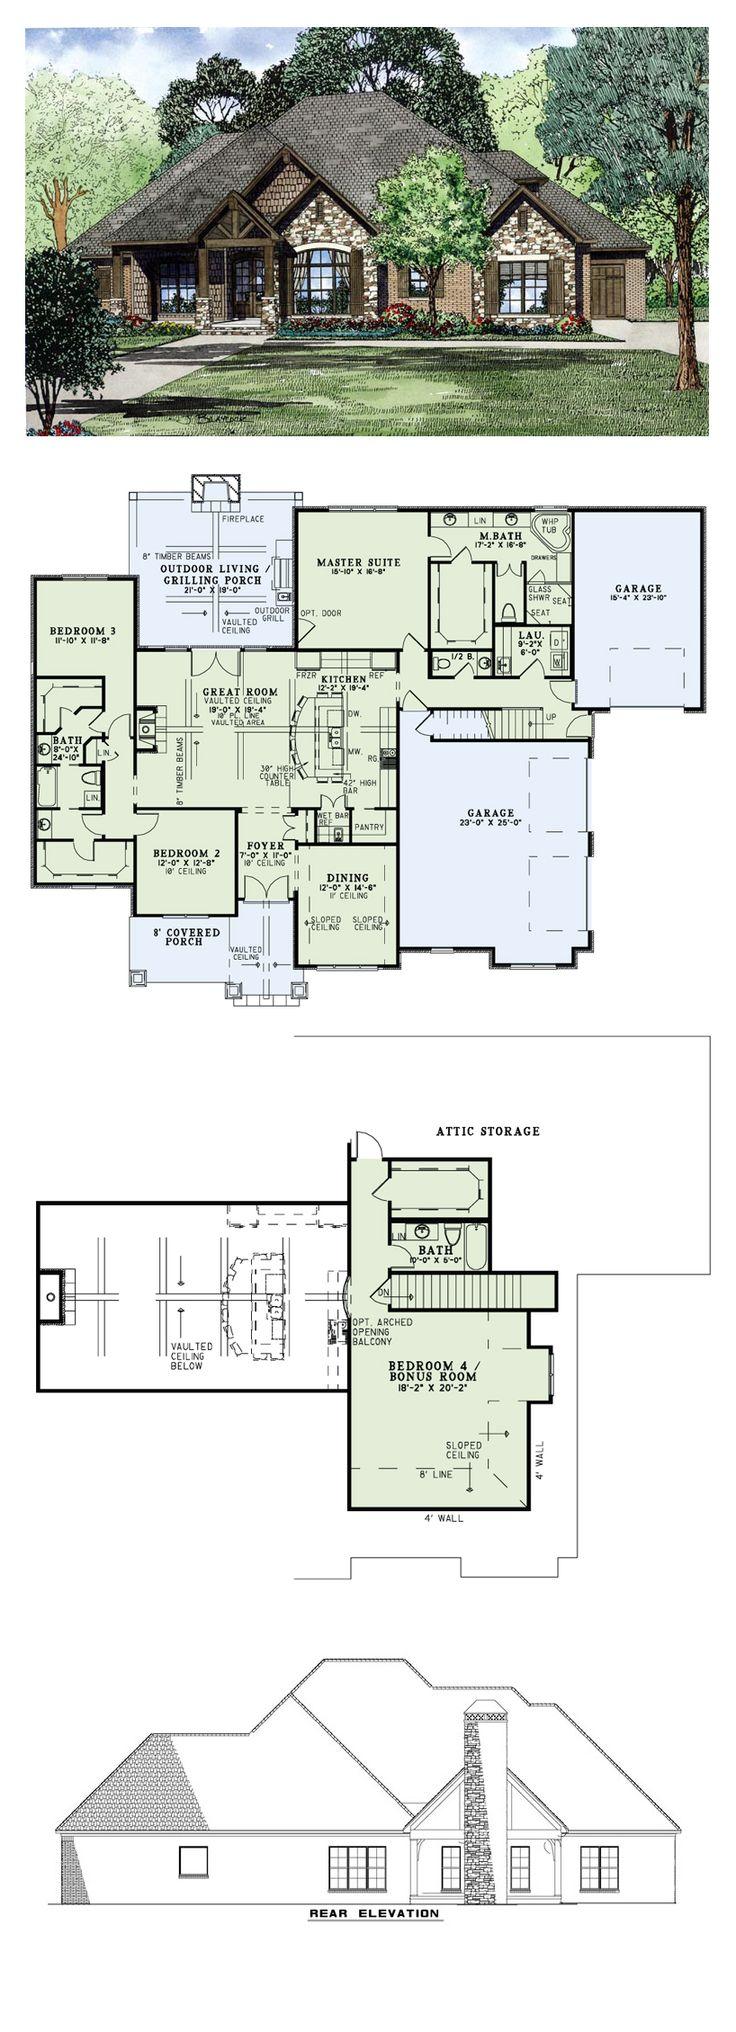 Craftsman european ranch tudor house plan 82162 for Best selling floor plans